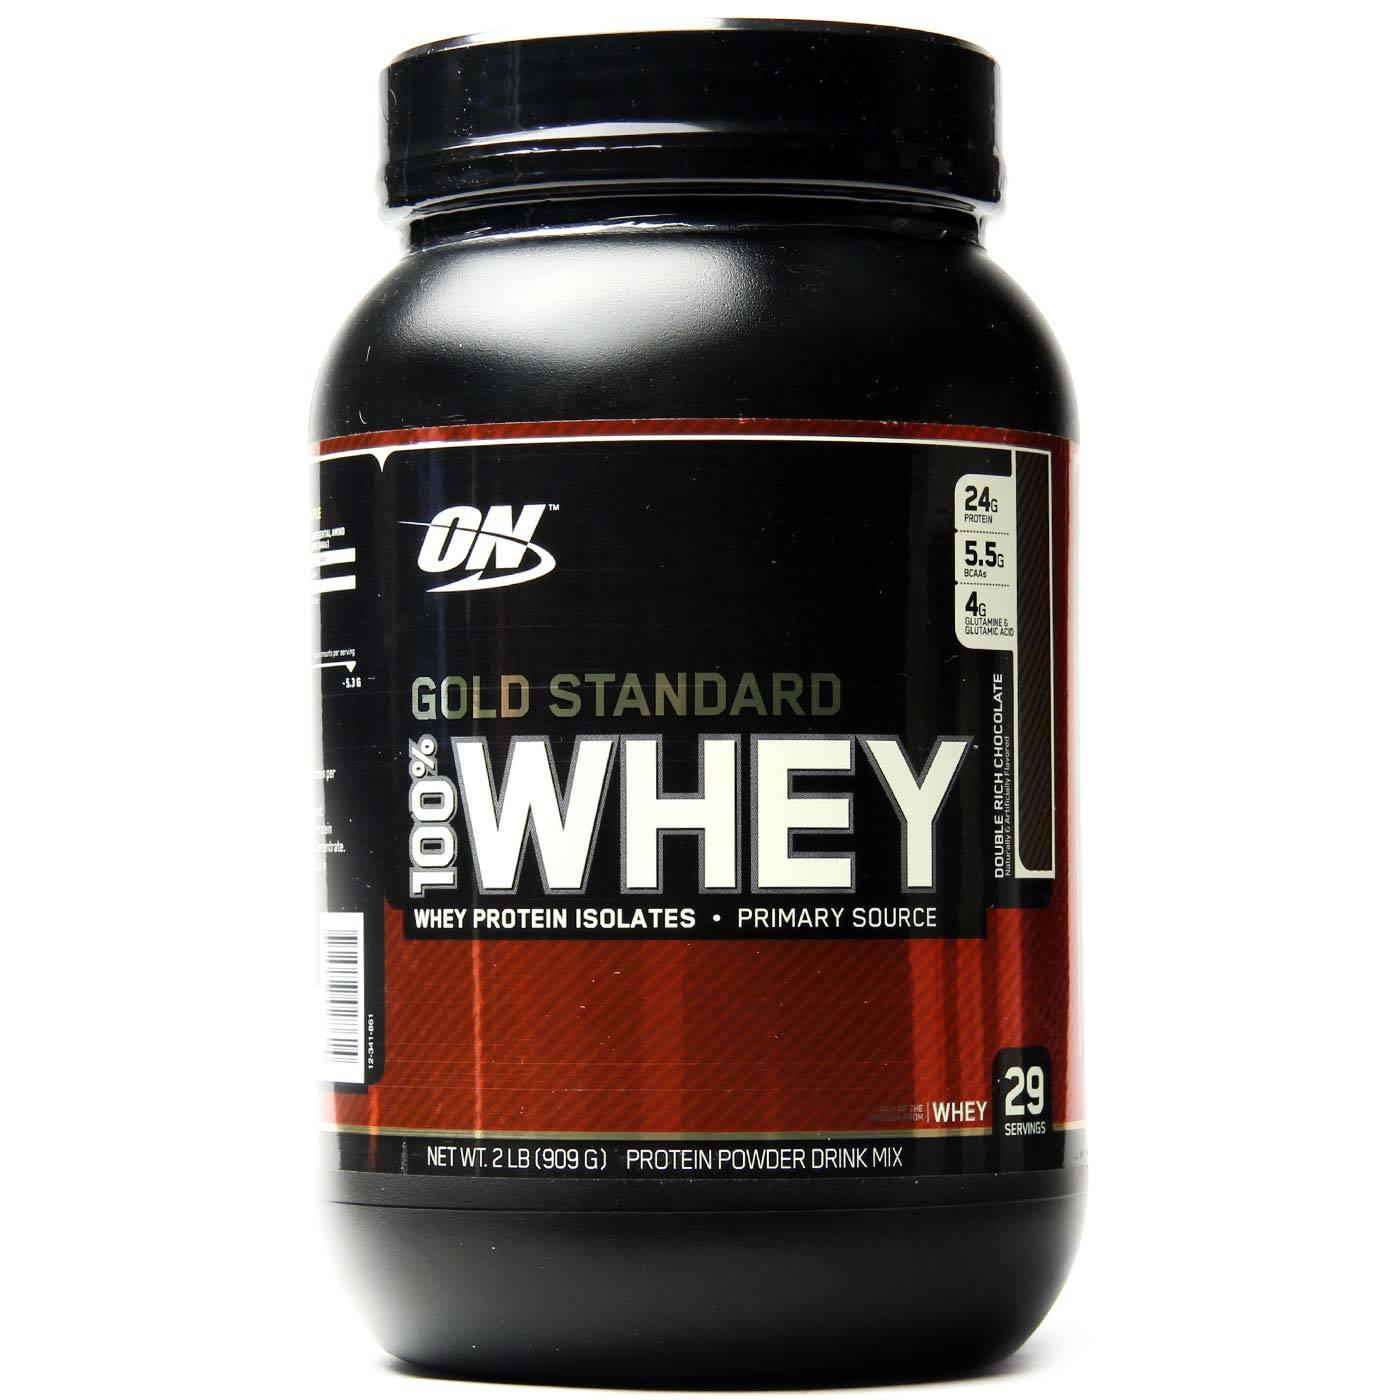 Cupom de desconto - 28% OFF em Whey Protein Optimum Nutrition Double Rich Chocolate 2 lbs / 909 g